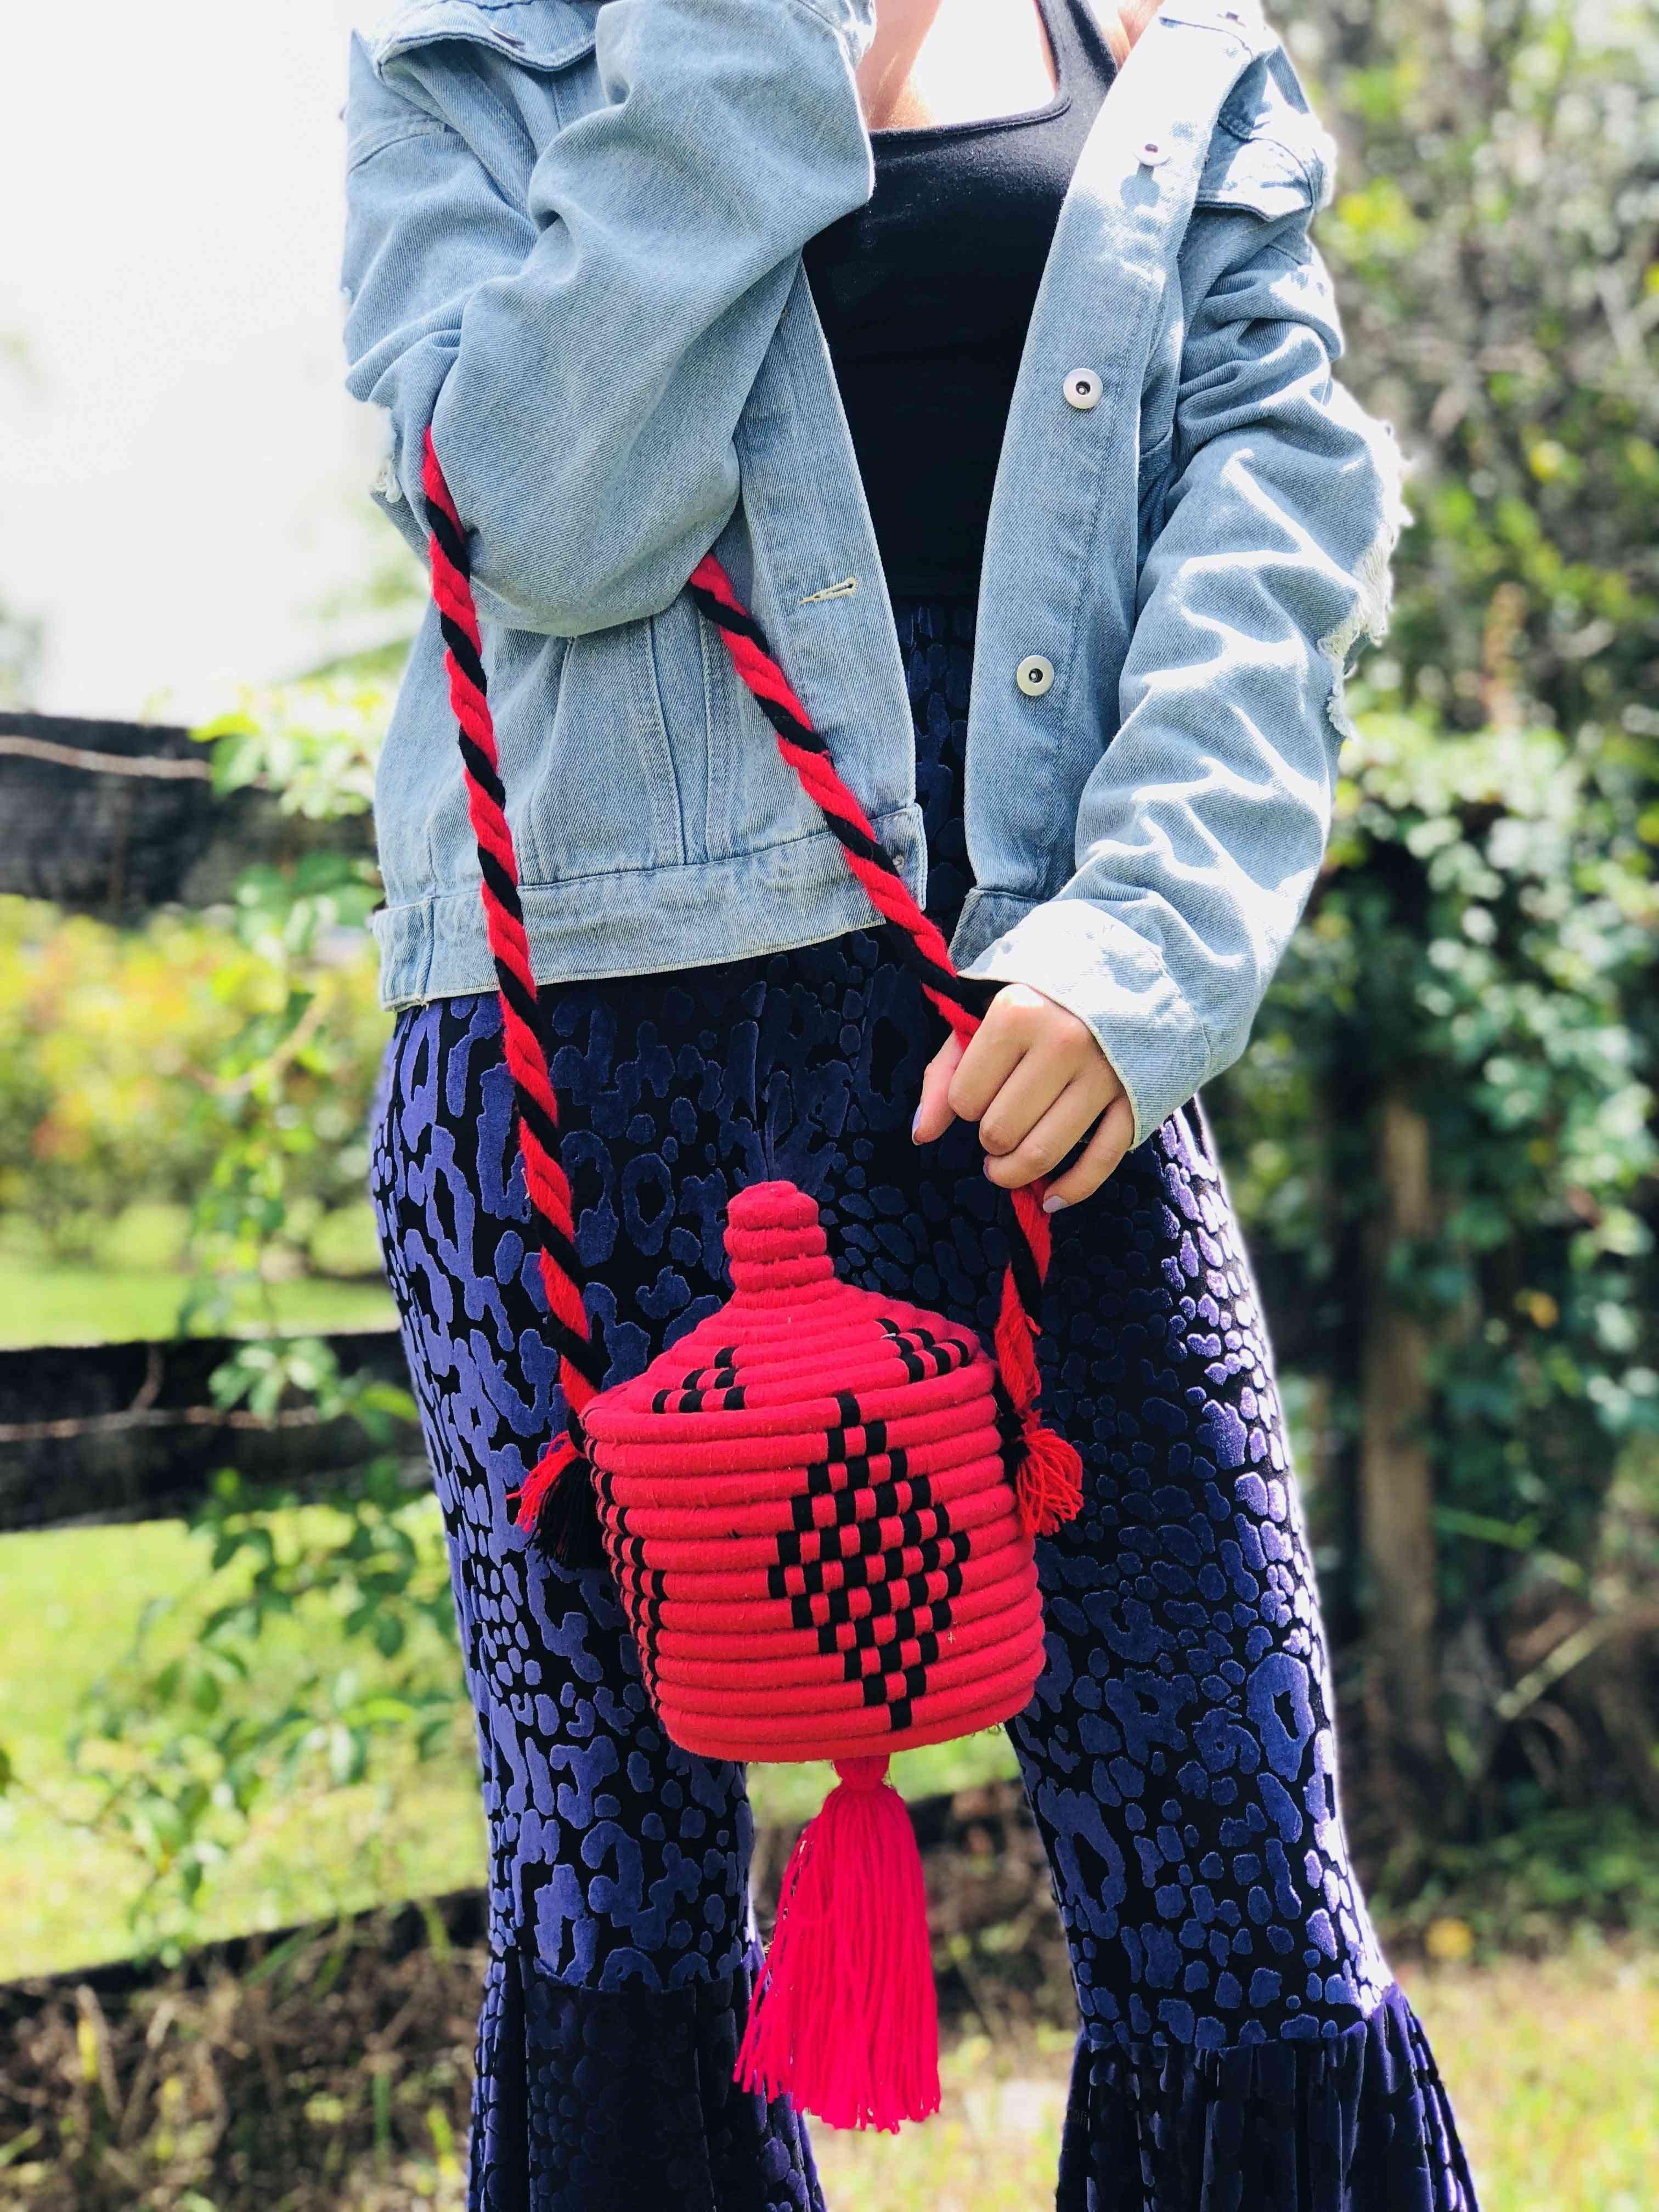 Handmade Traditional Bead Bucket Bag